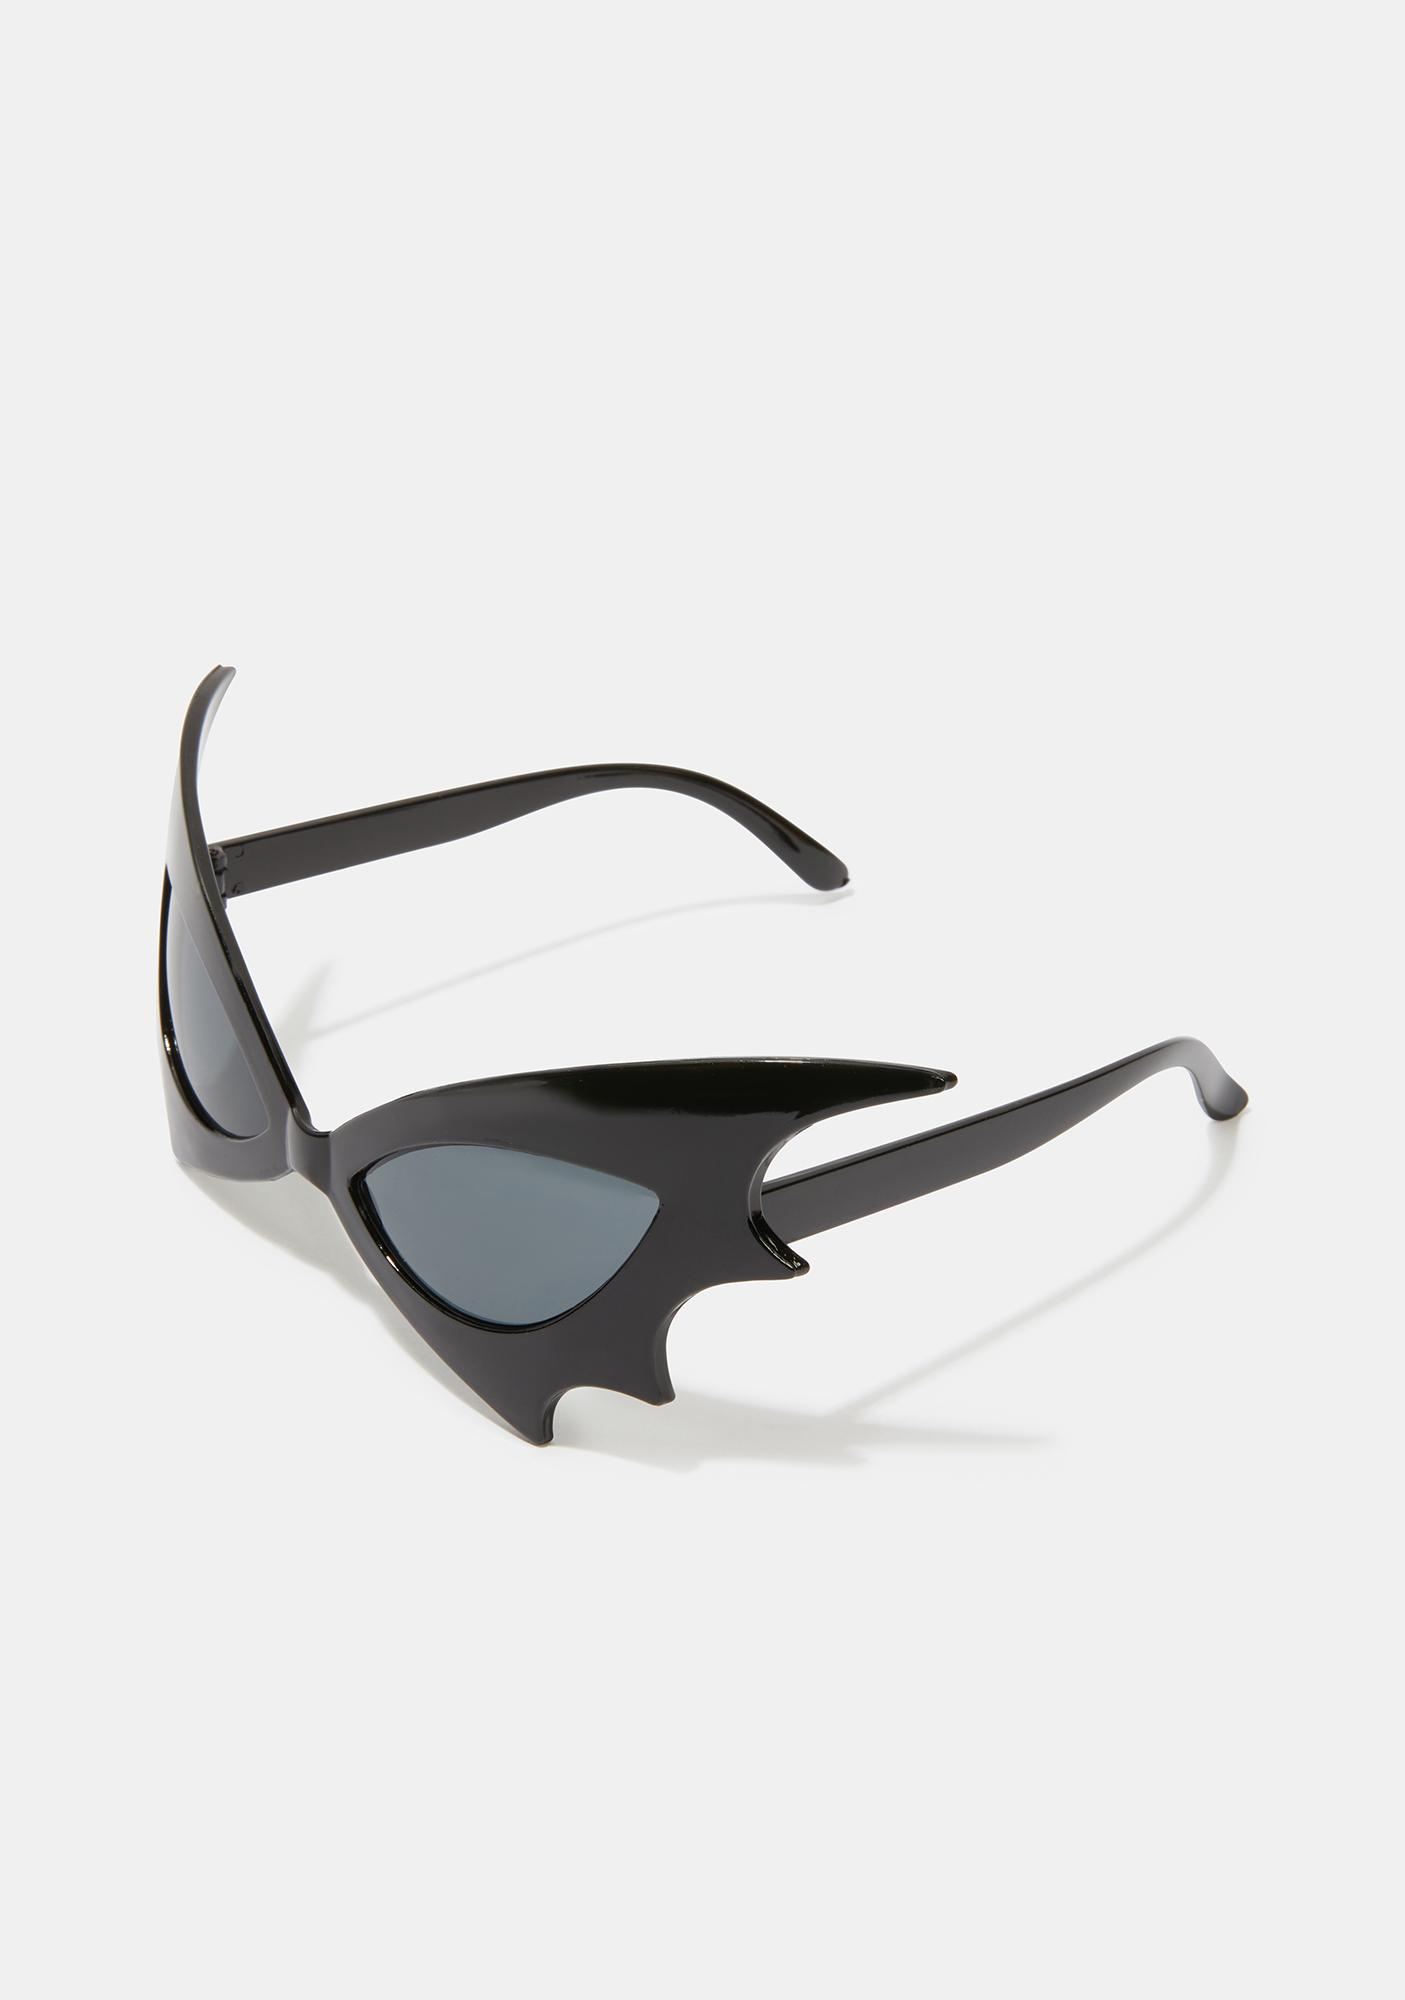 Batting My Lashes Sunglasses